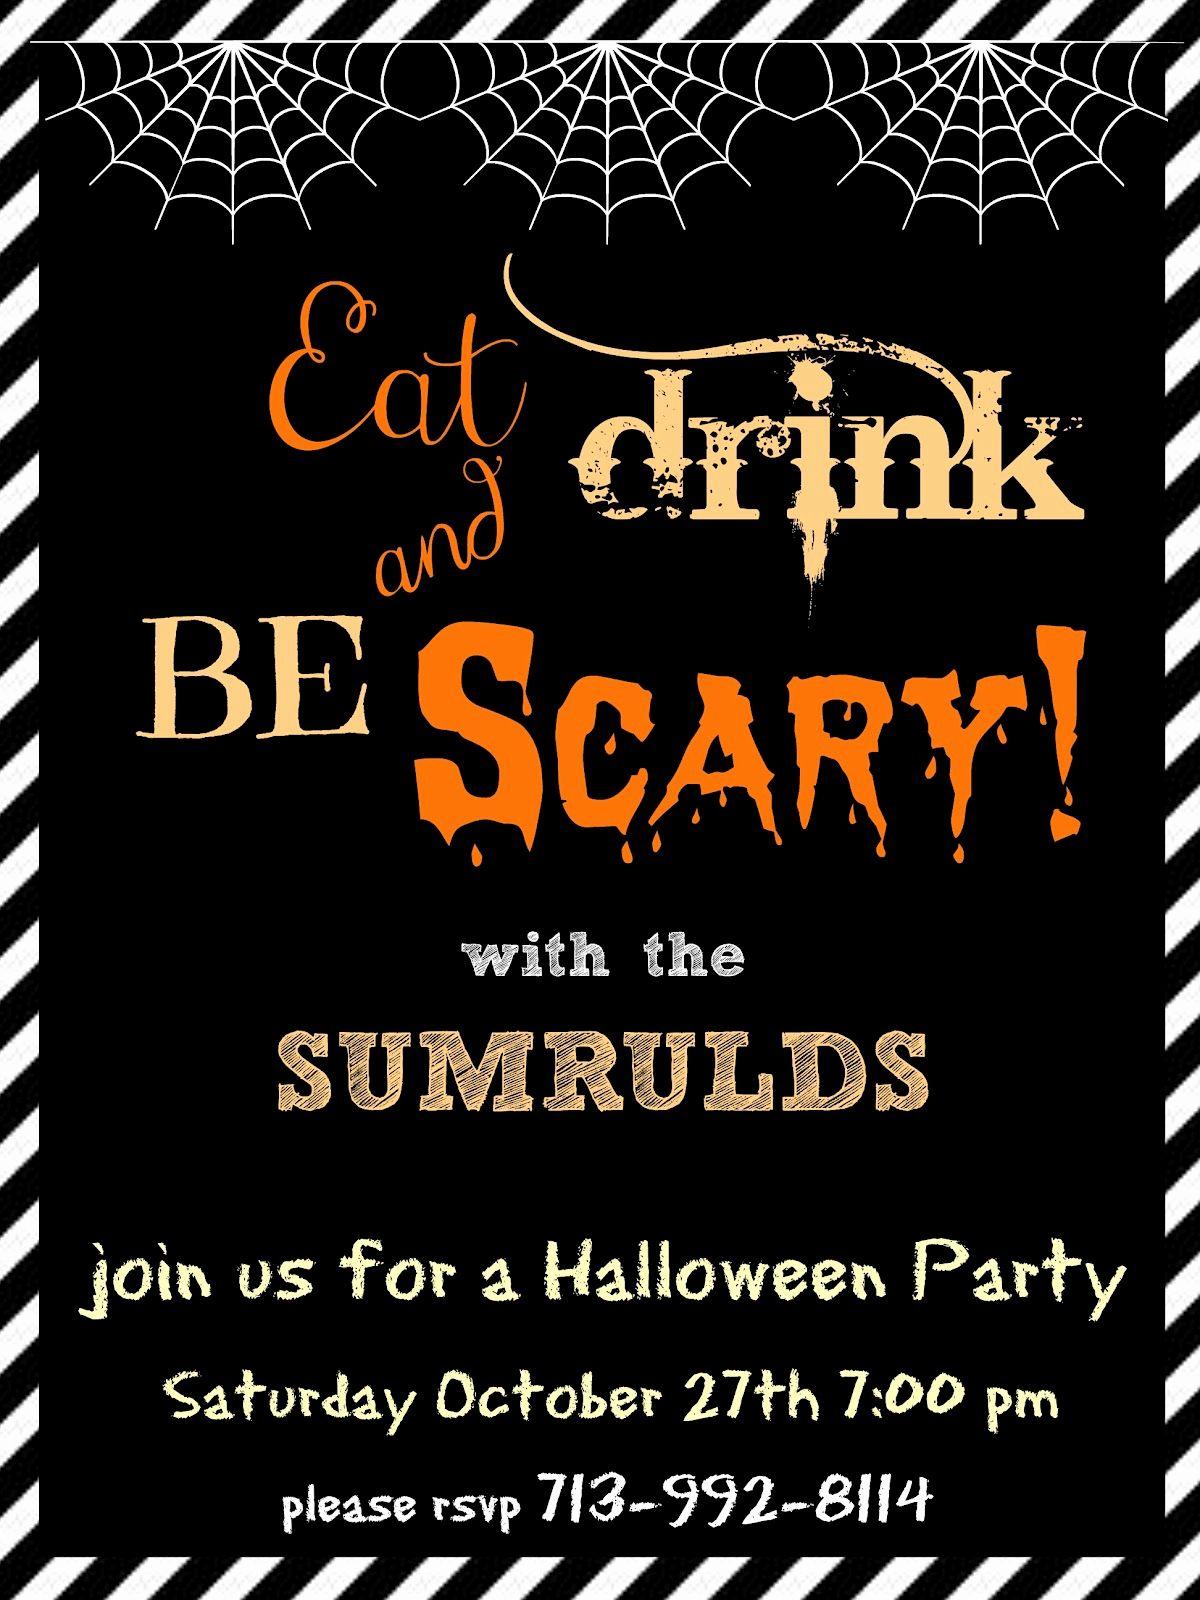 Free Halloween Party Invitation Templates Luxury Hallo Halloween Party Invitation Template Free Halloween Party Invitations Free Halloween Invitation Templates